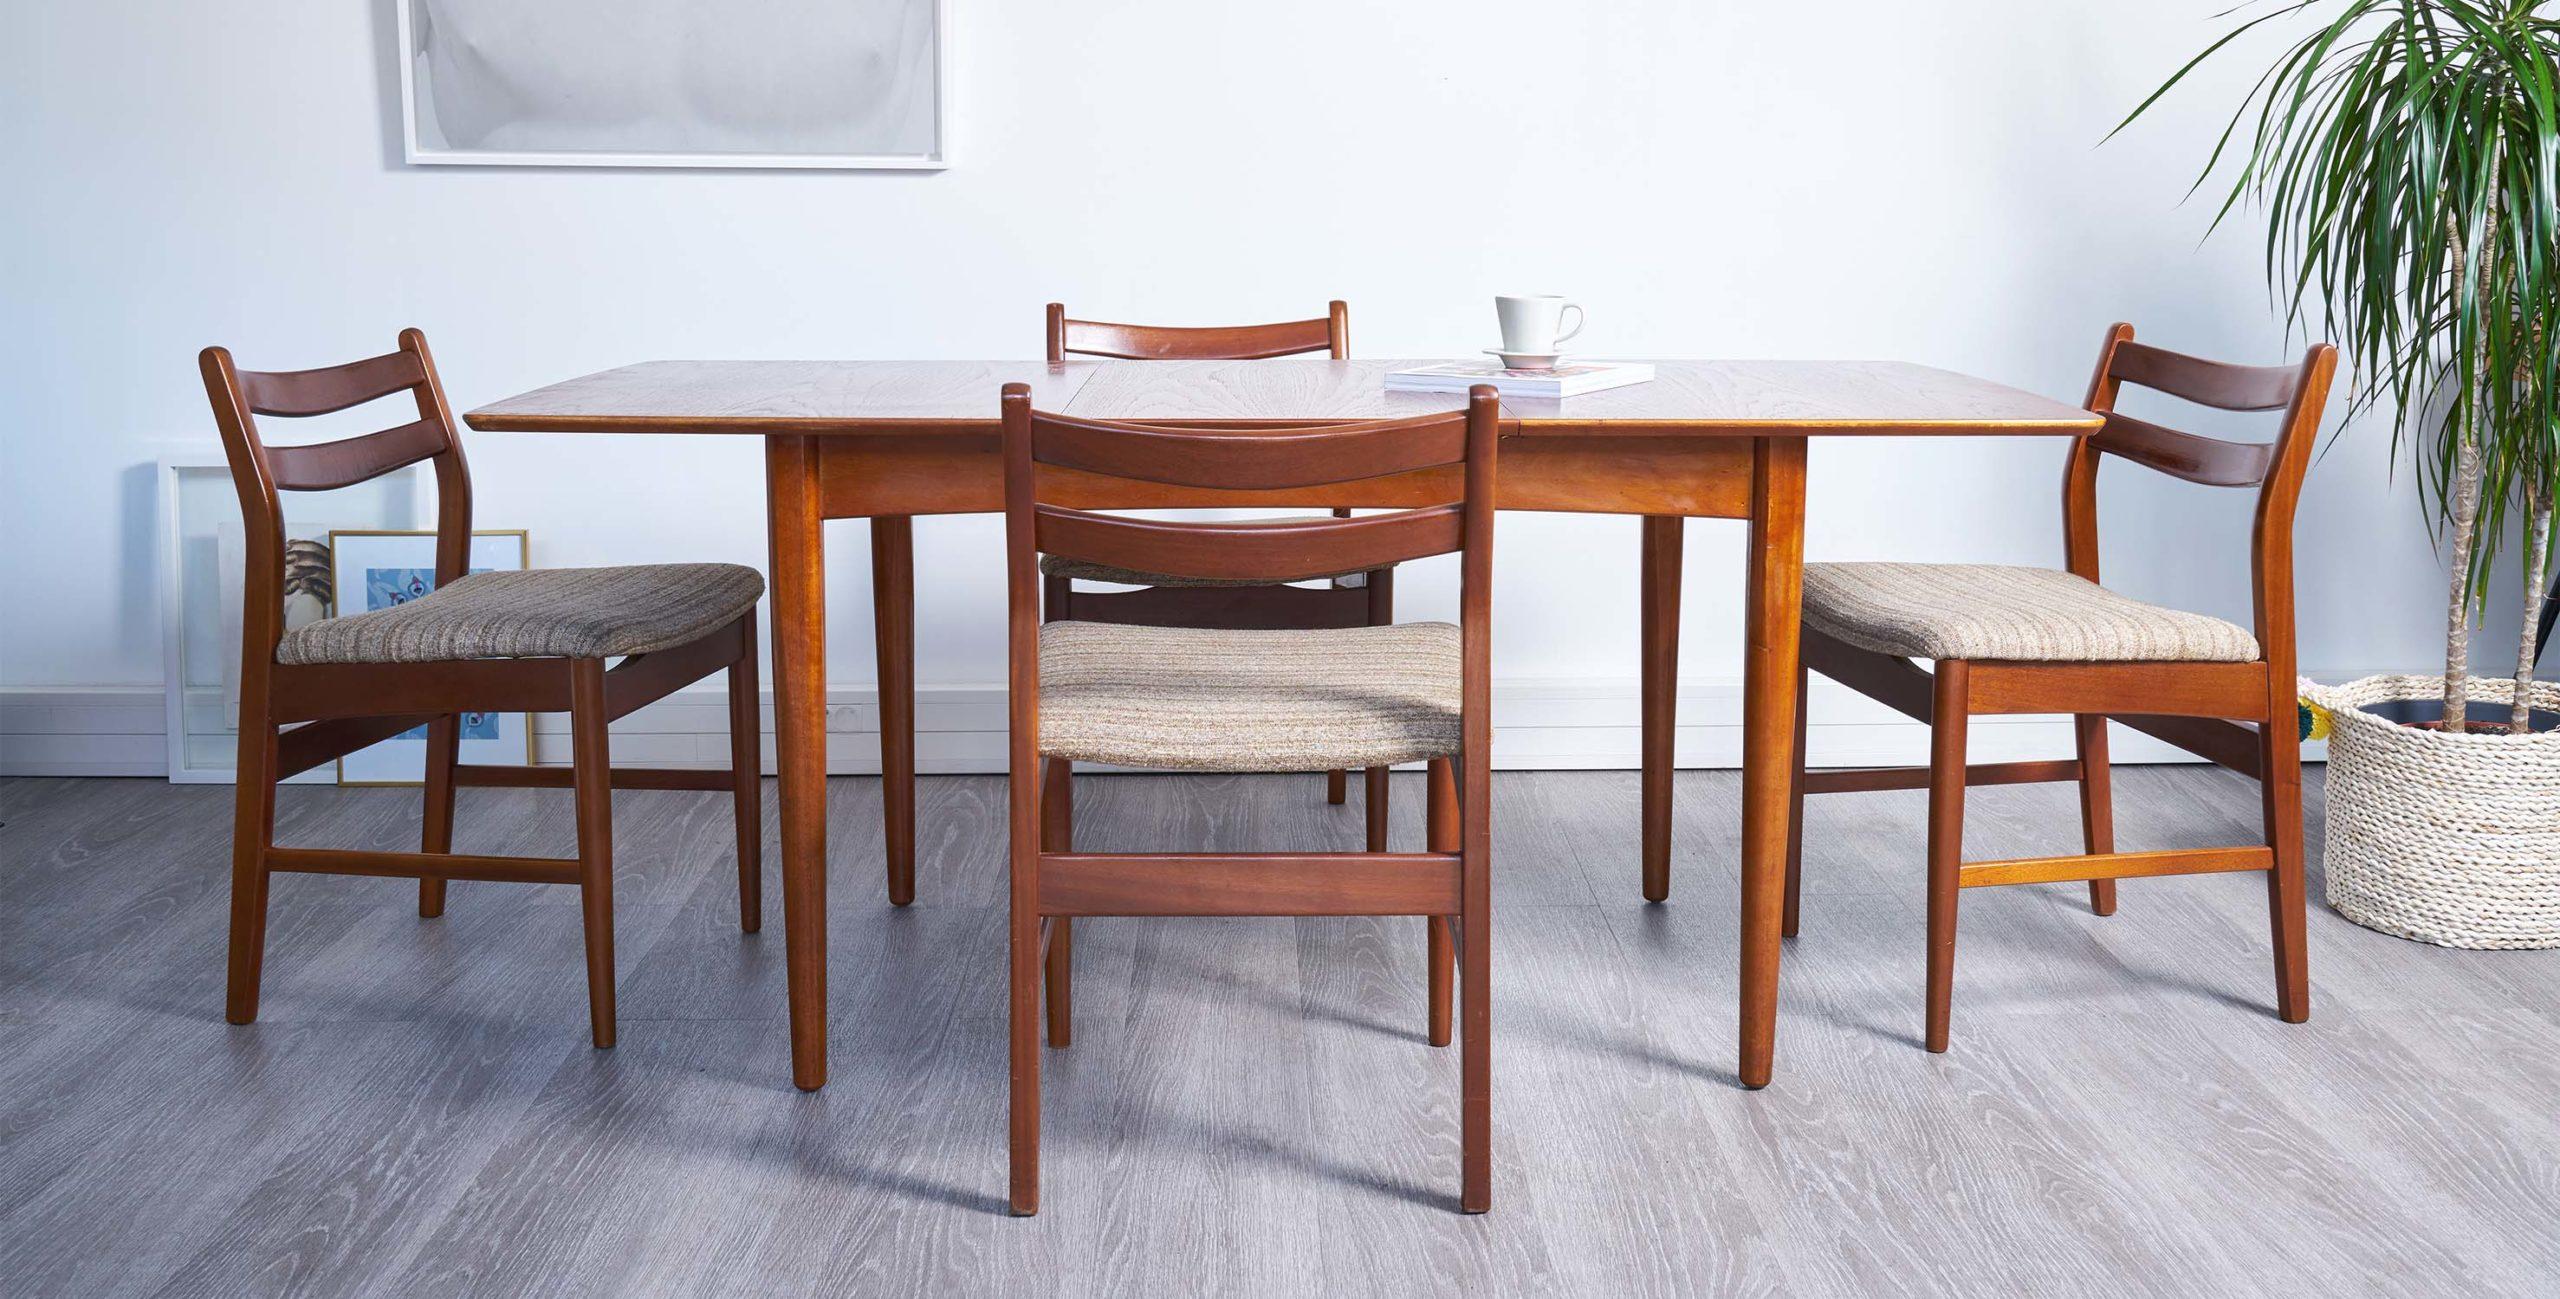 meubles vintage scandinave chez scandi style